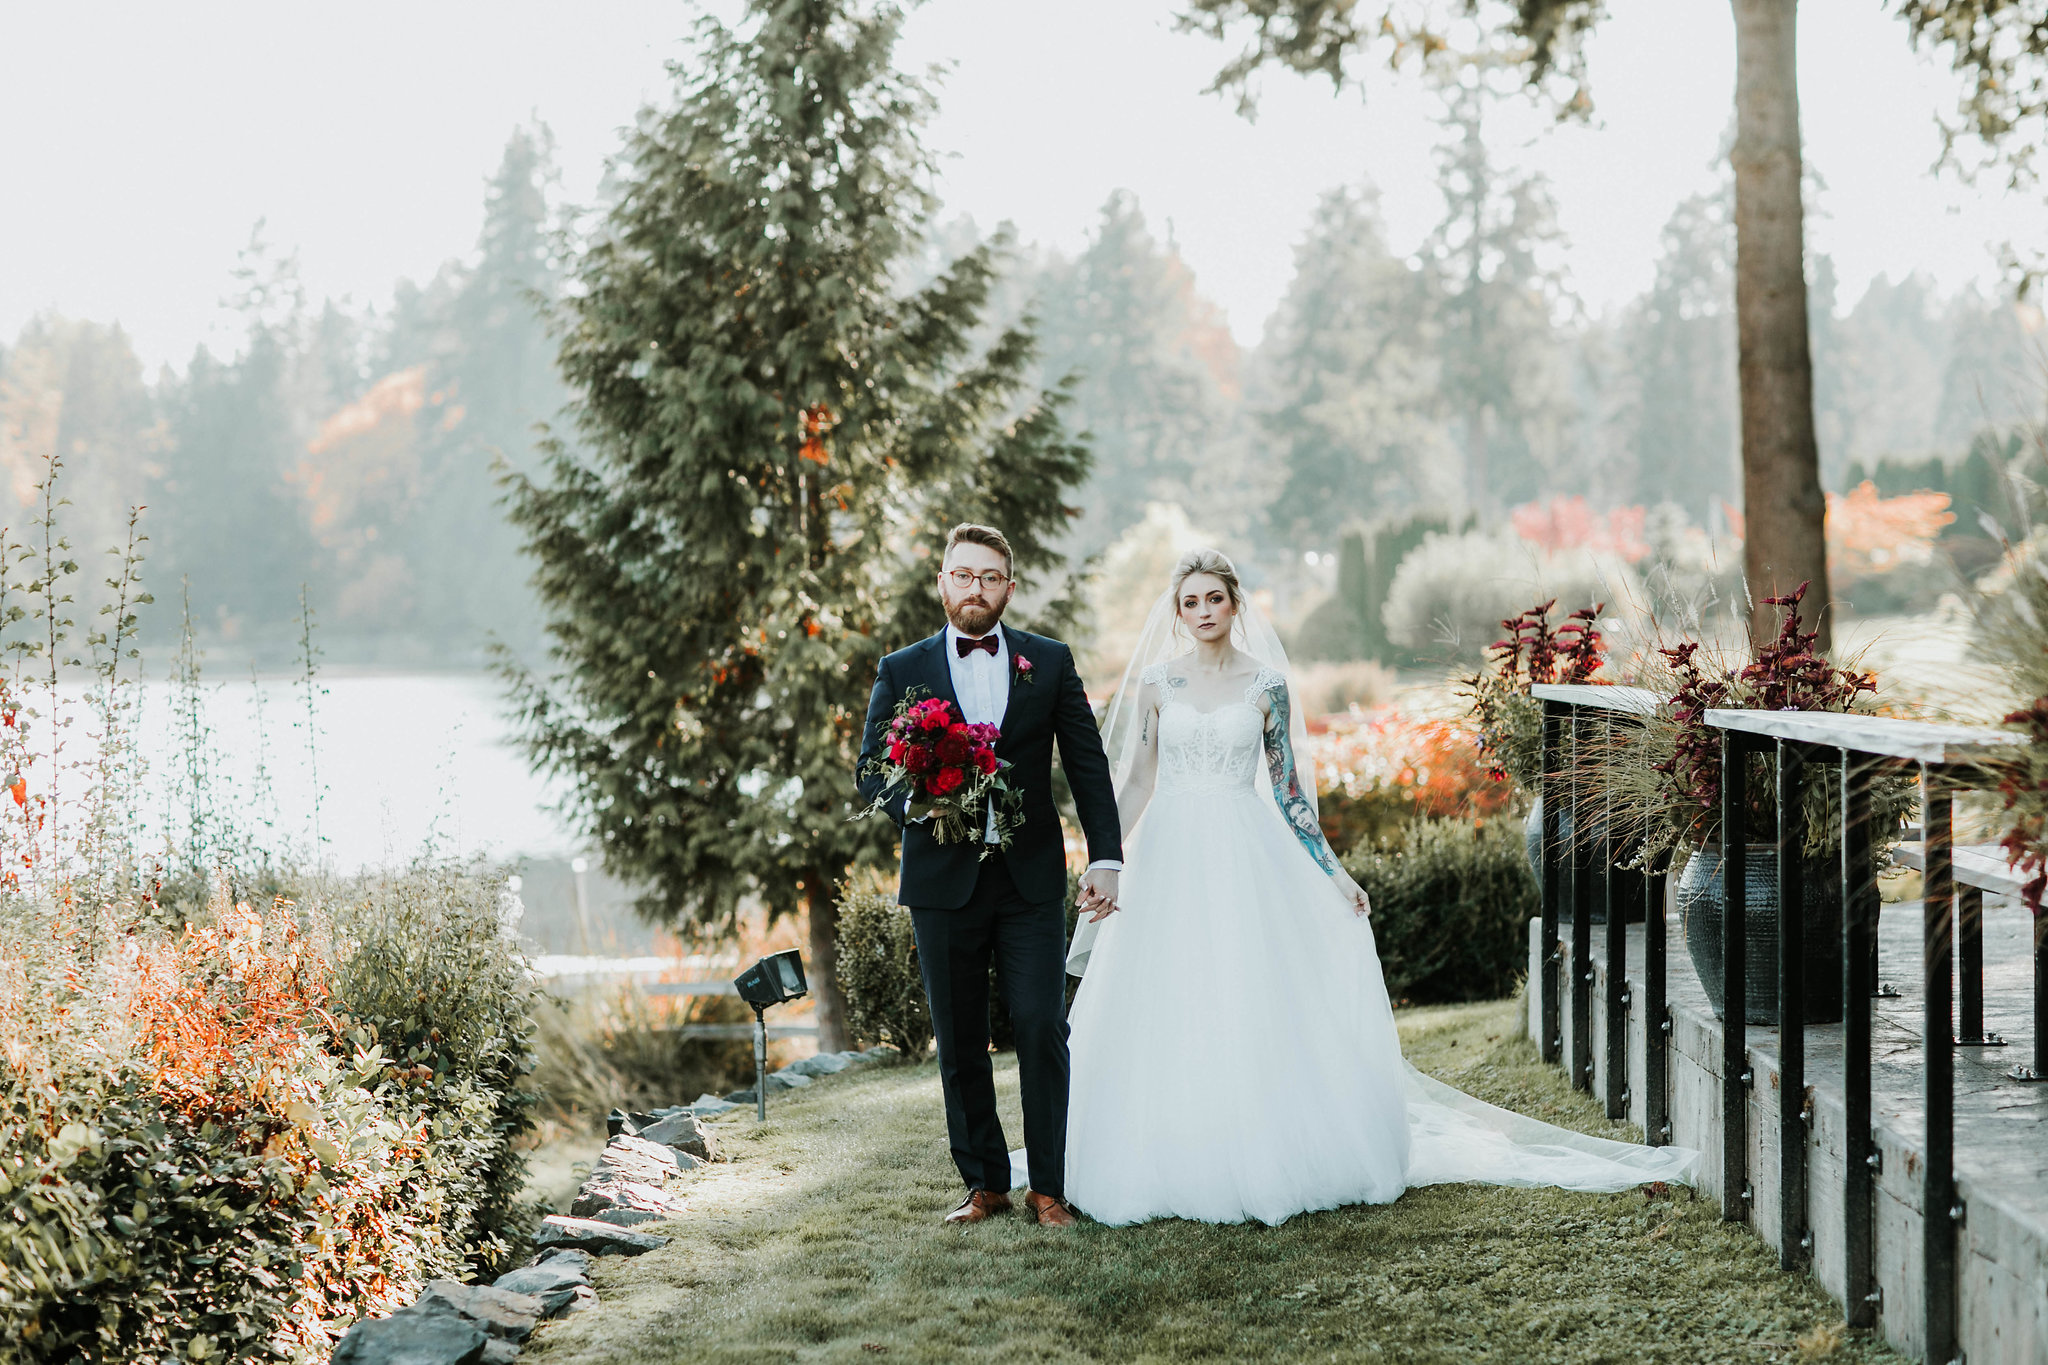 Crystal_Lake_lodge_Wedding_photos_by_Adina_Preston_Weddings_190.JPG